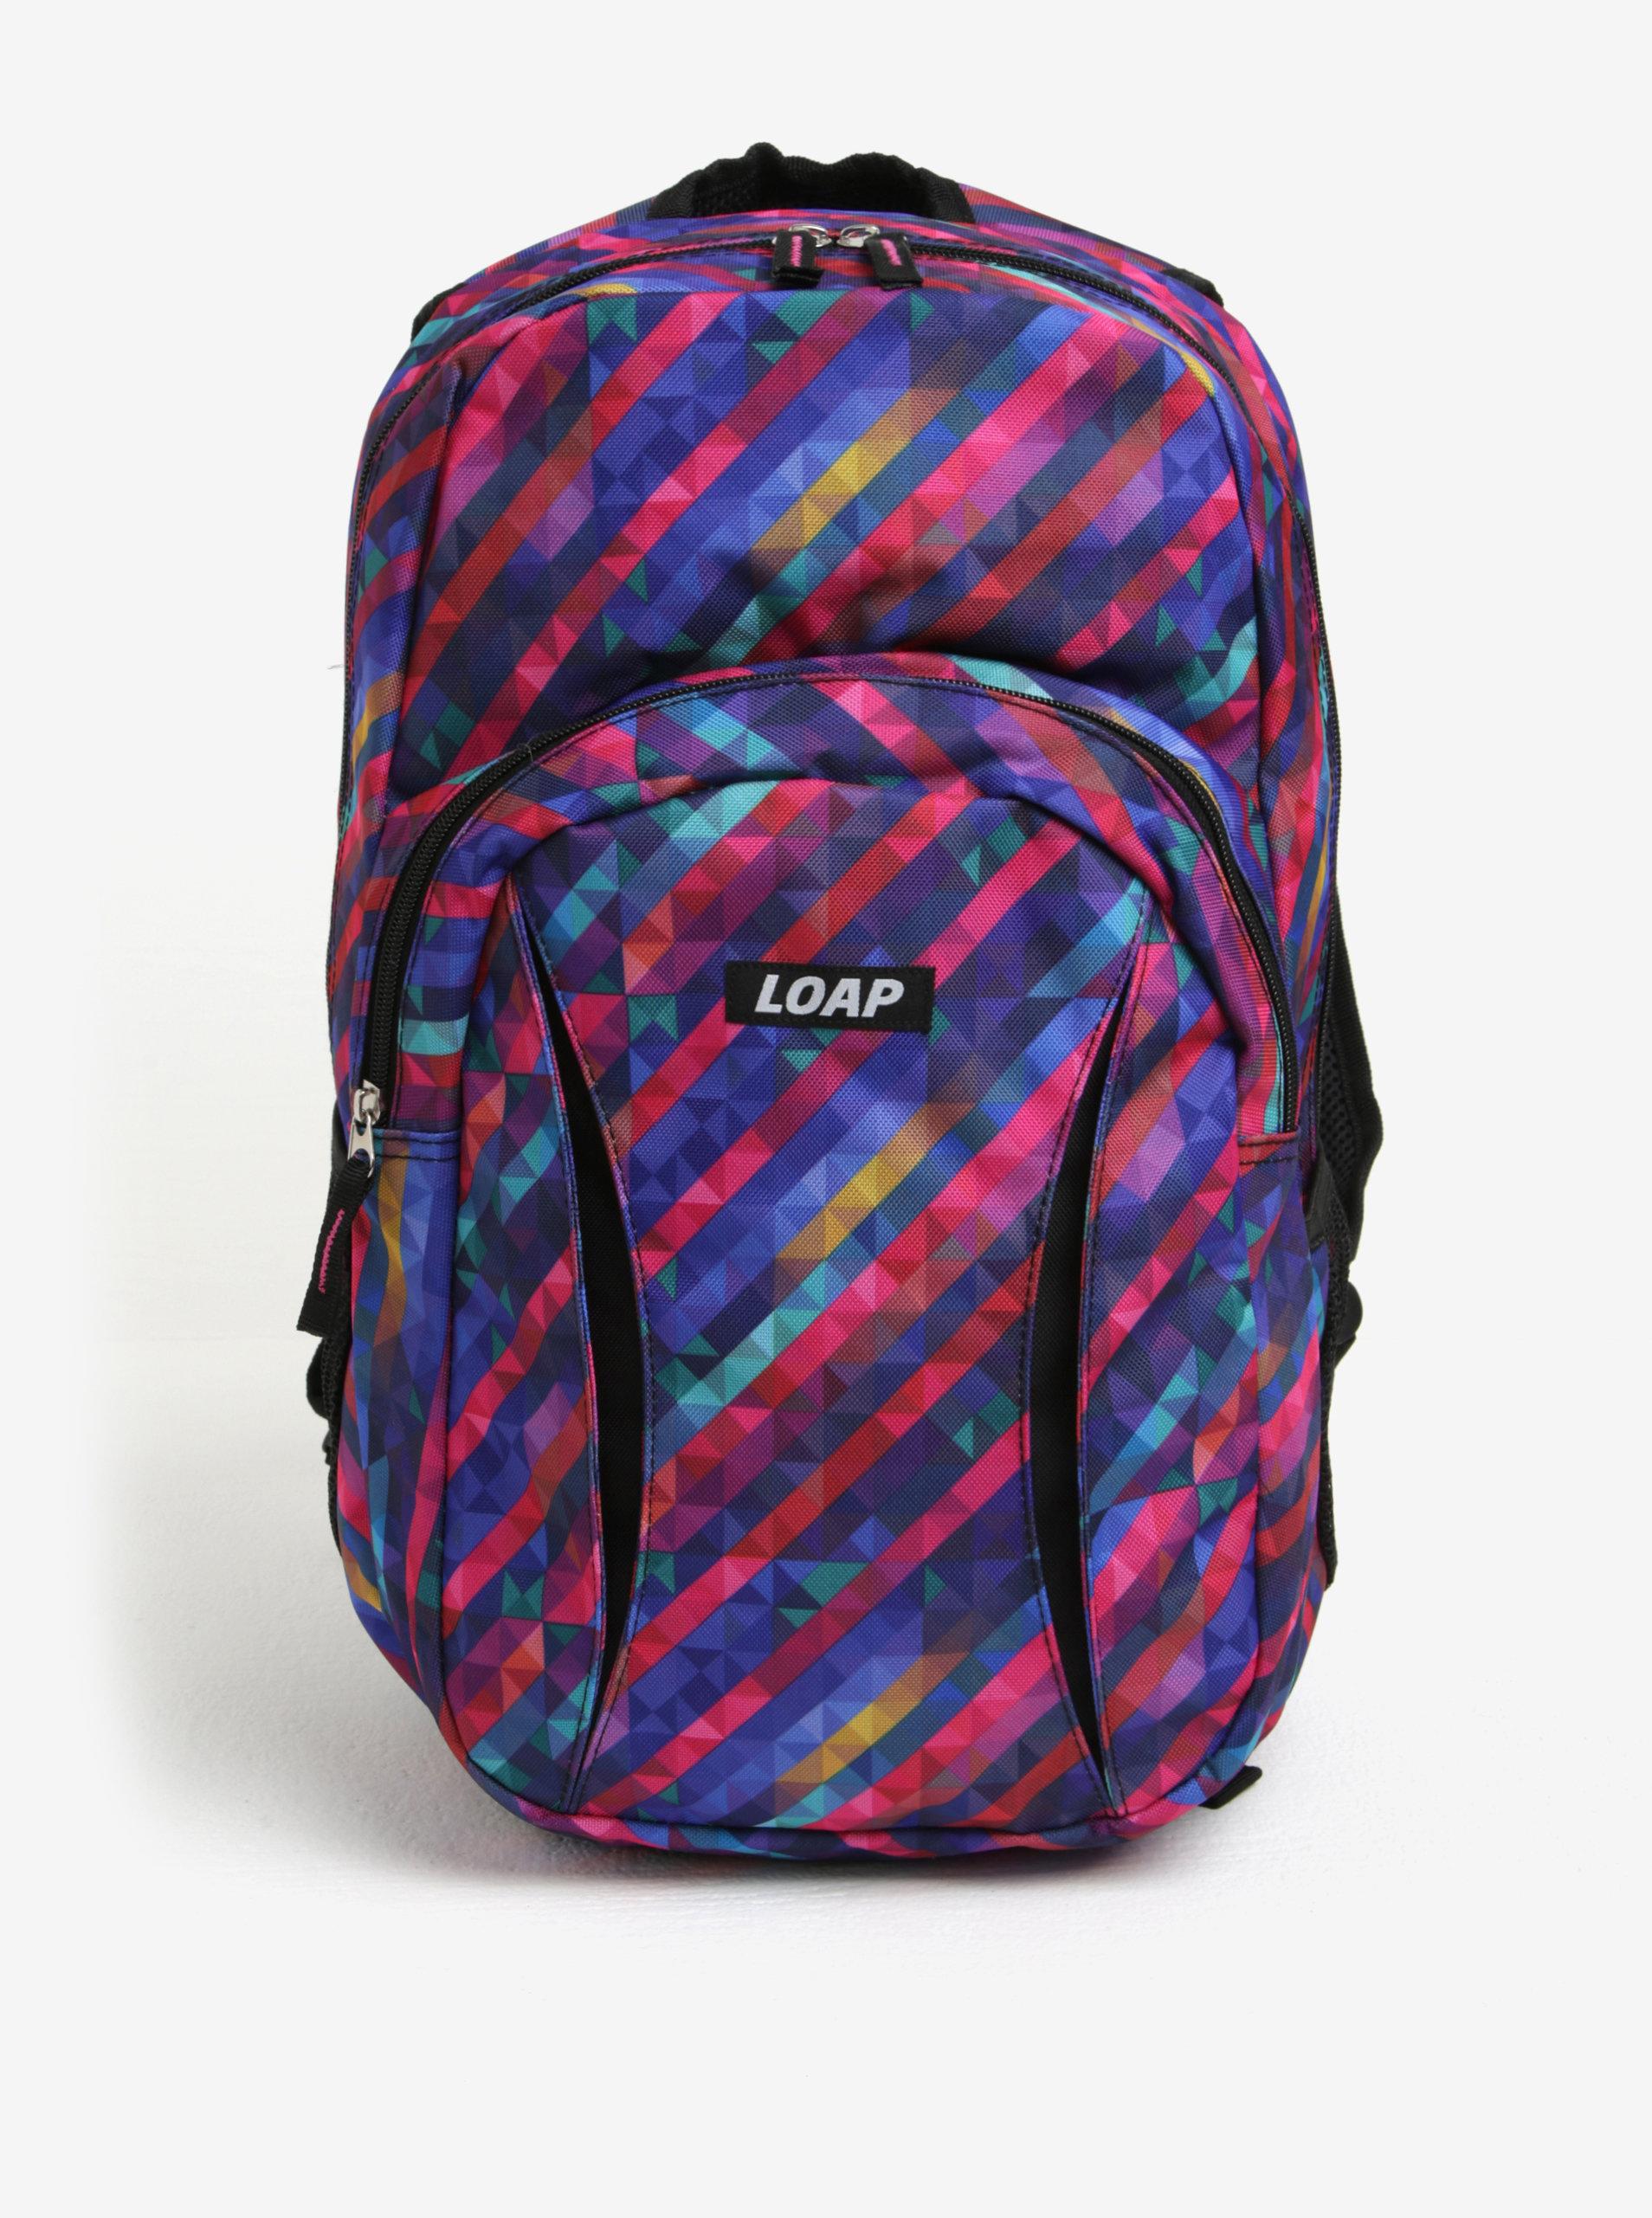 1e610ad7f2f7 Fialový dámsky vzorovaný batoh LOAP Asso 20 l ...